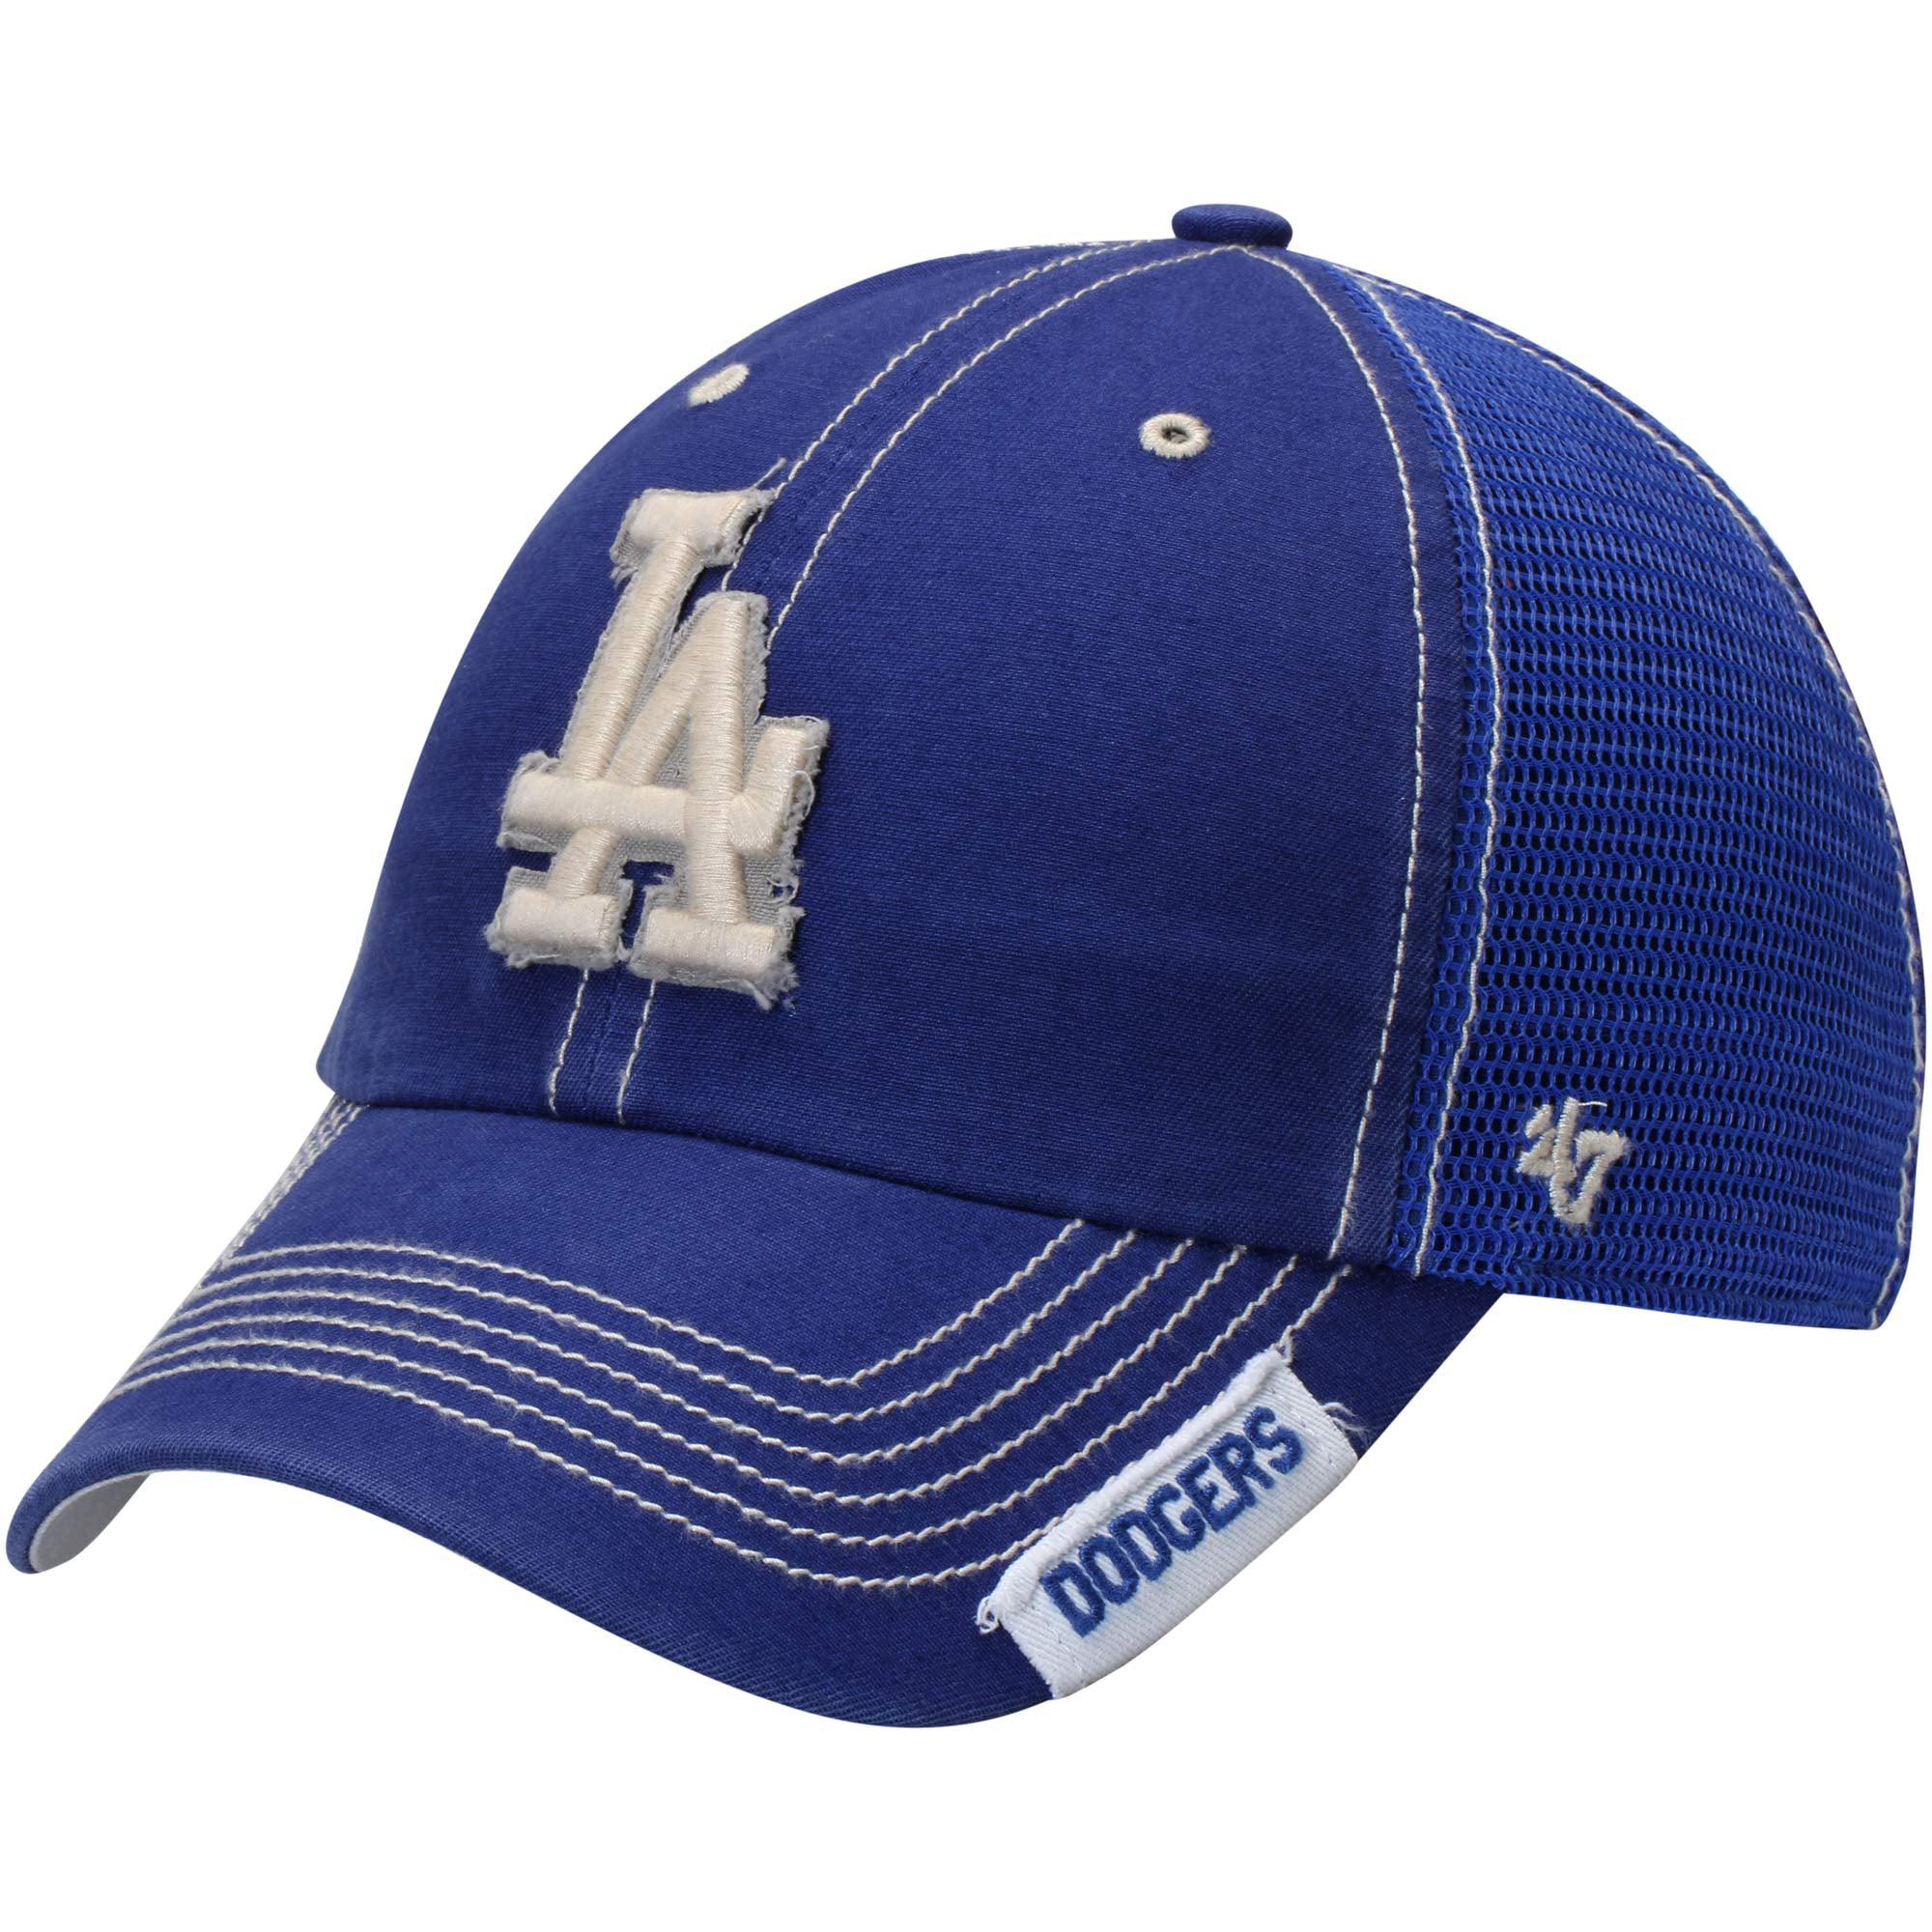 Los Angeles Dodgers '47 Turner Clean-Up Adjustable Hat - Royal - OSFA